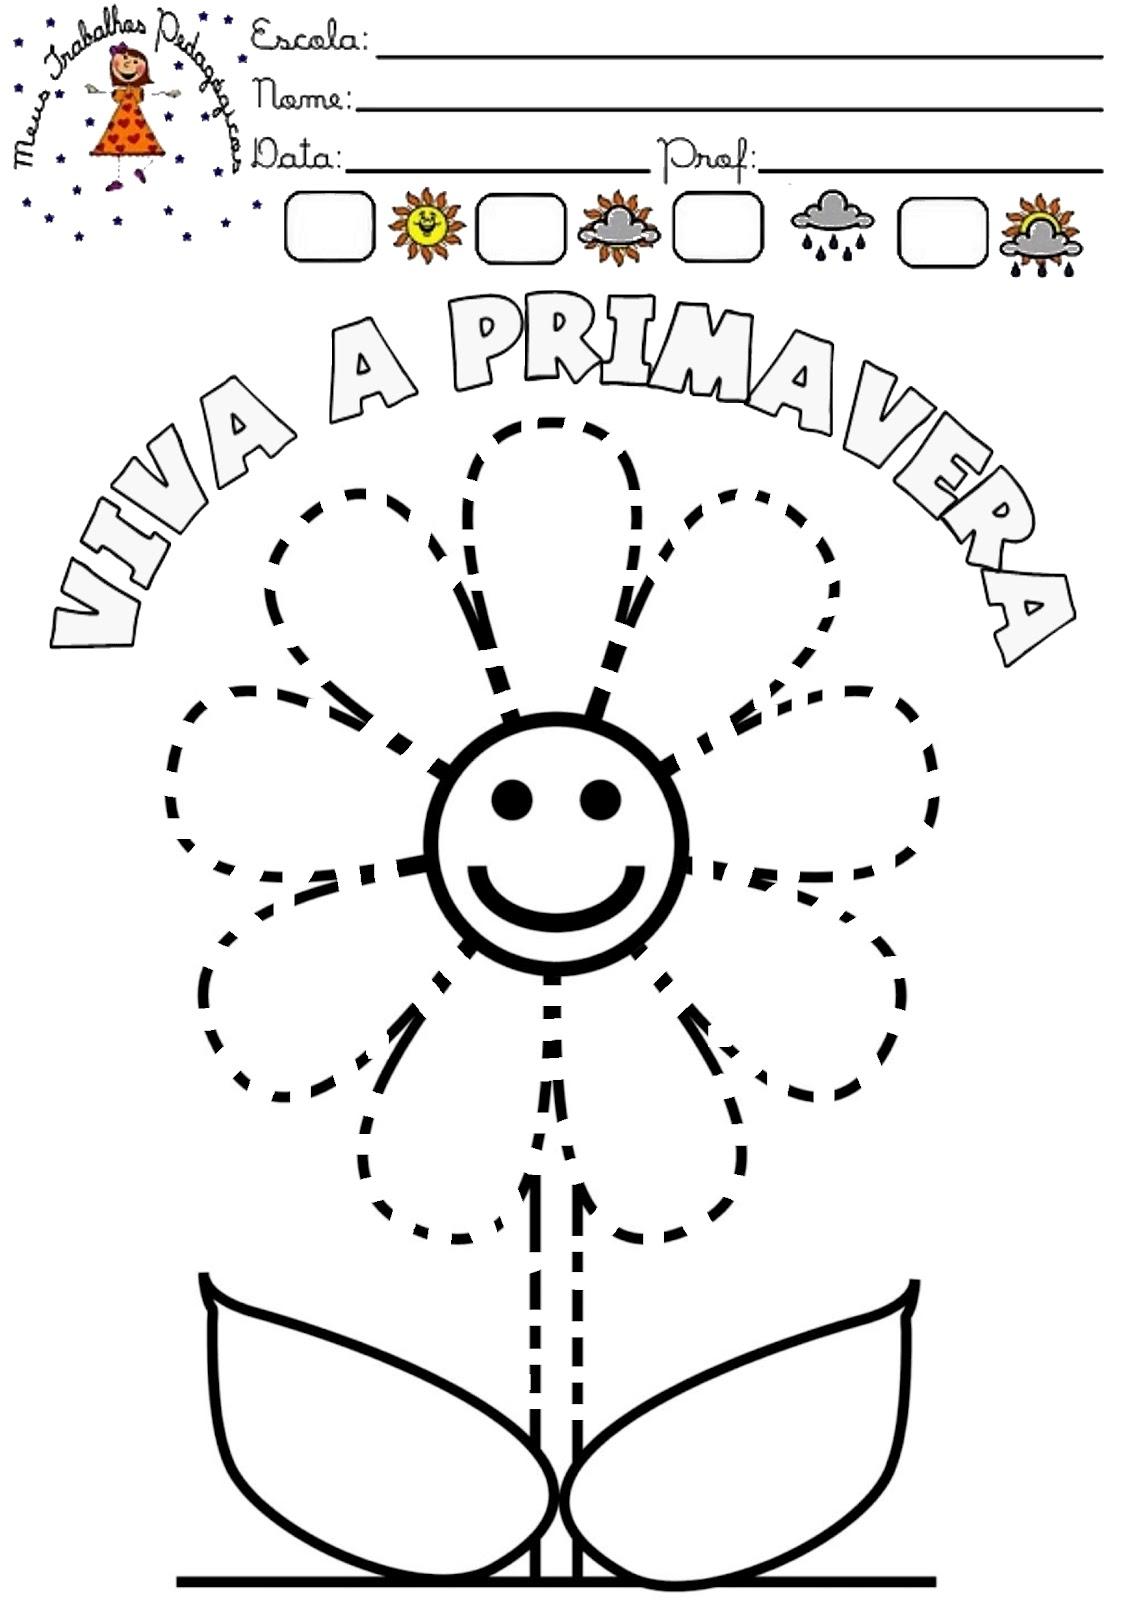 Amado 6ª CRE_DESAFIOS - PSE - NSEC 06: IDÉIAS para Primavera - Flores  UX33